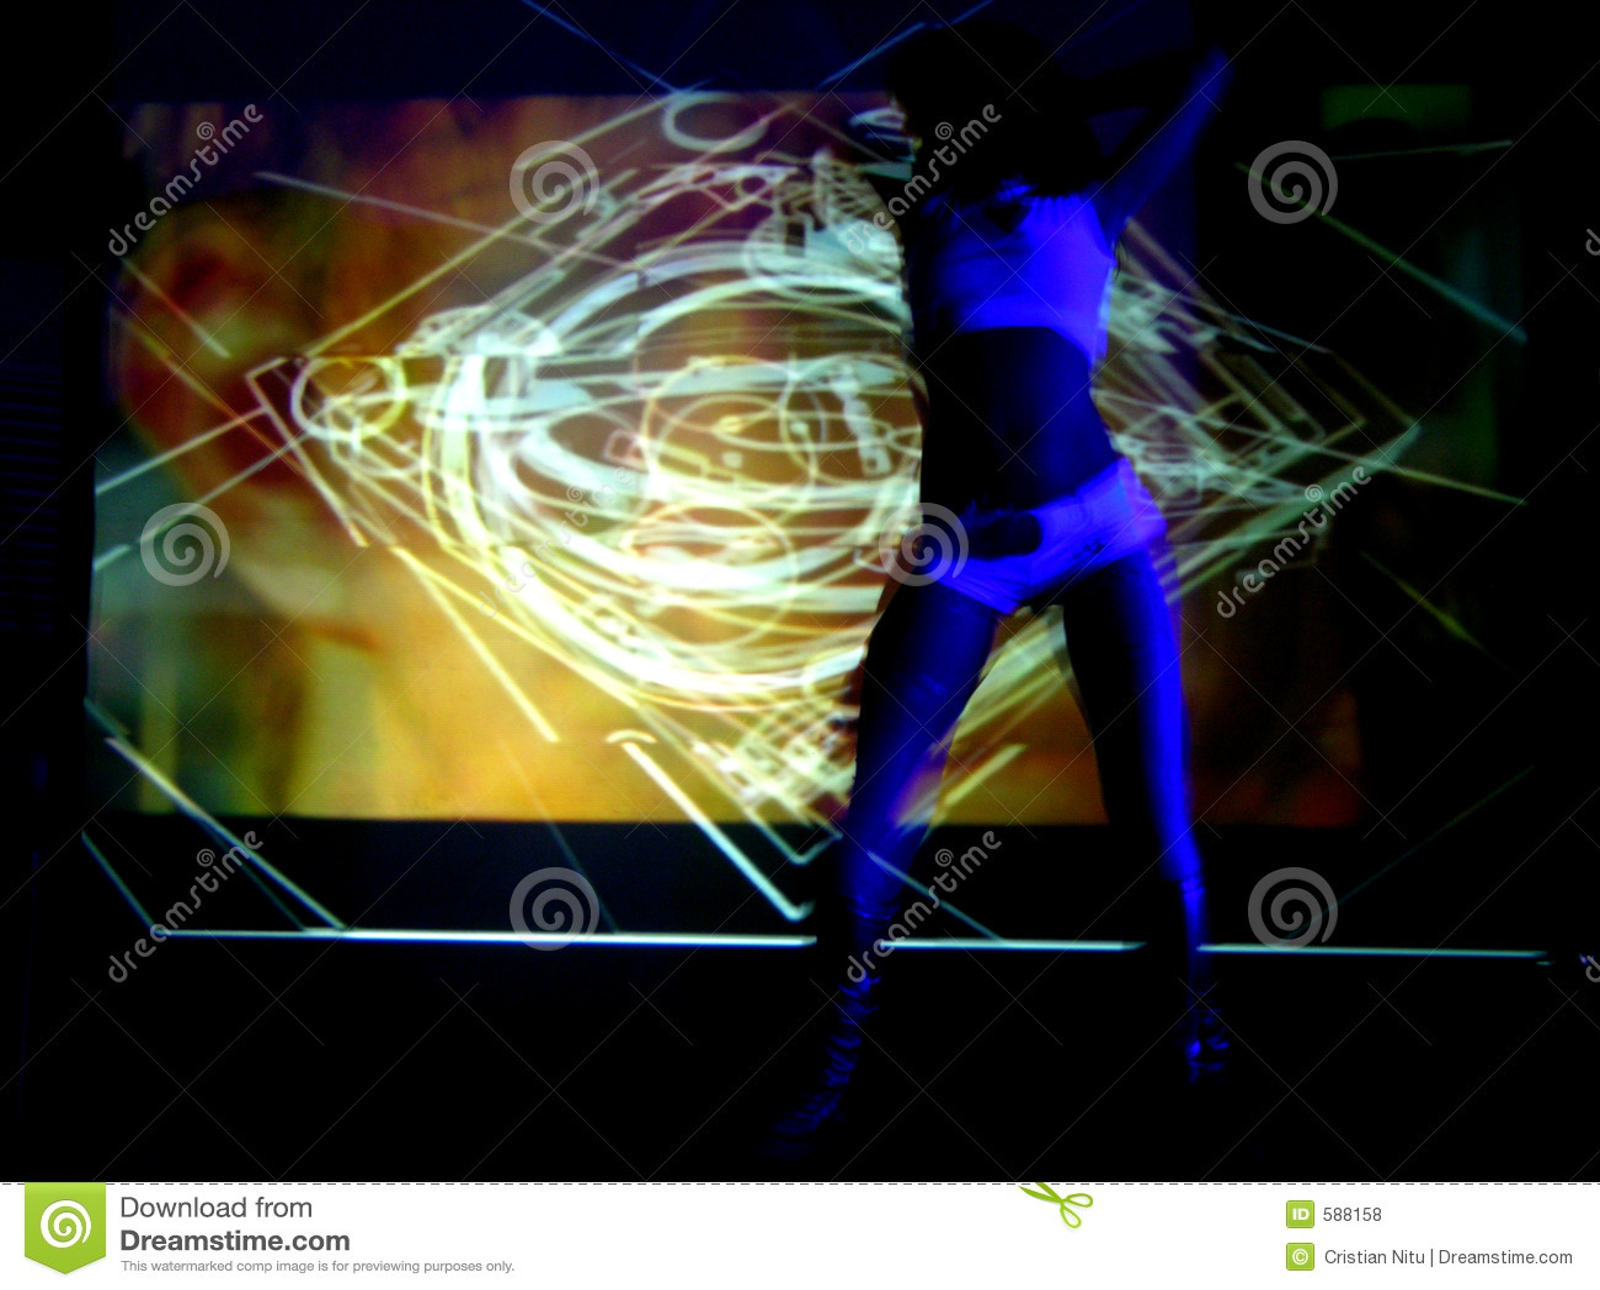 Dancer In Action